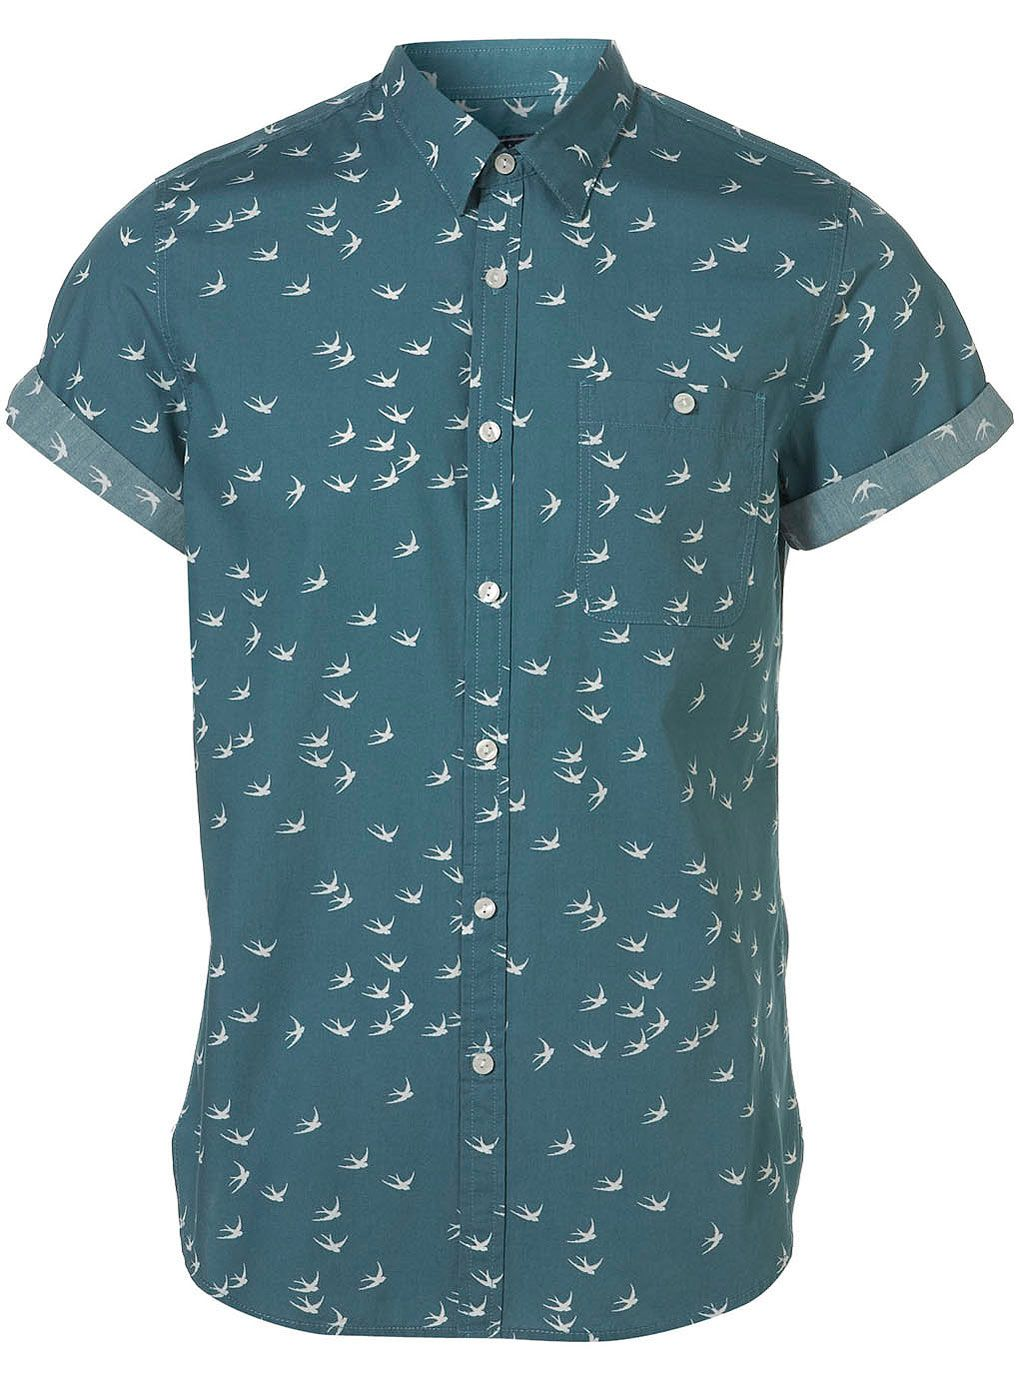 55e1e807bd43 Topman Green Swallow Pattern Short Sleeve Shirt in Green for Men | Lyst